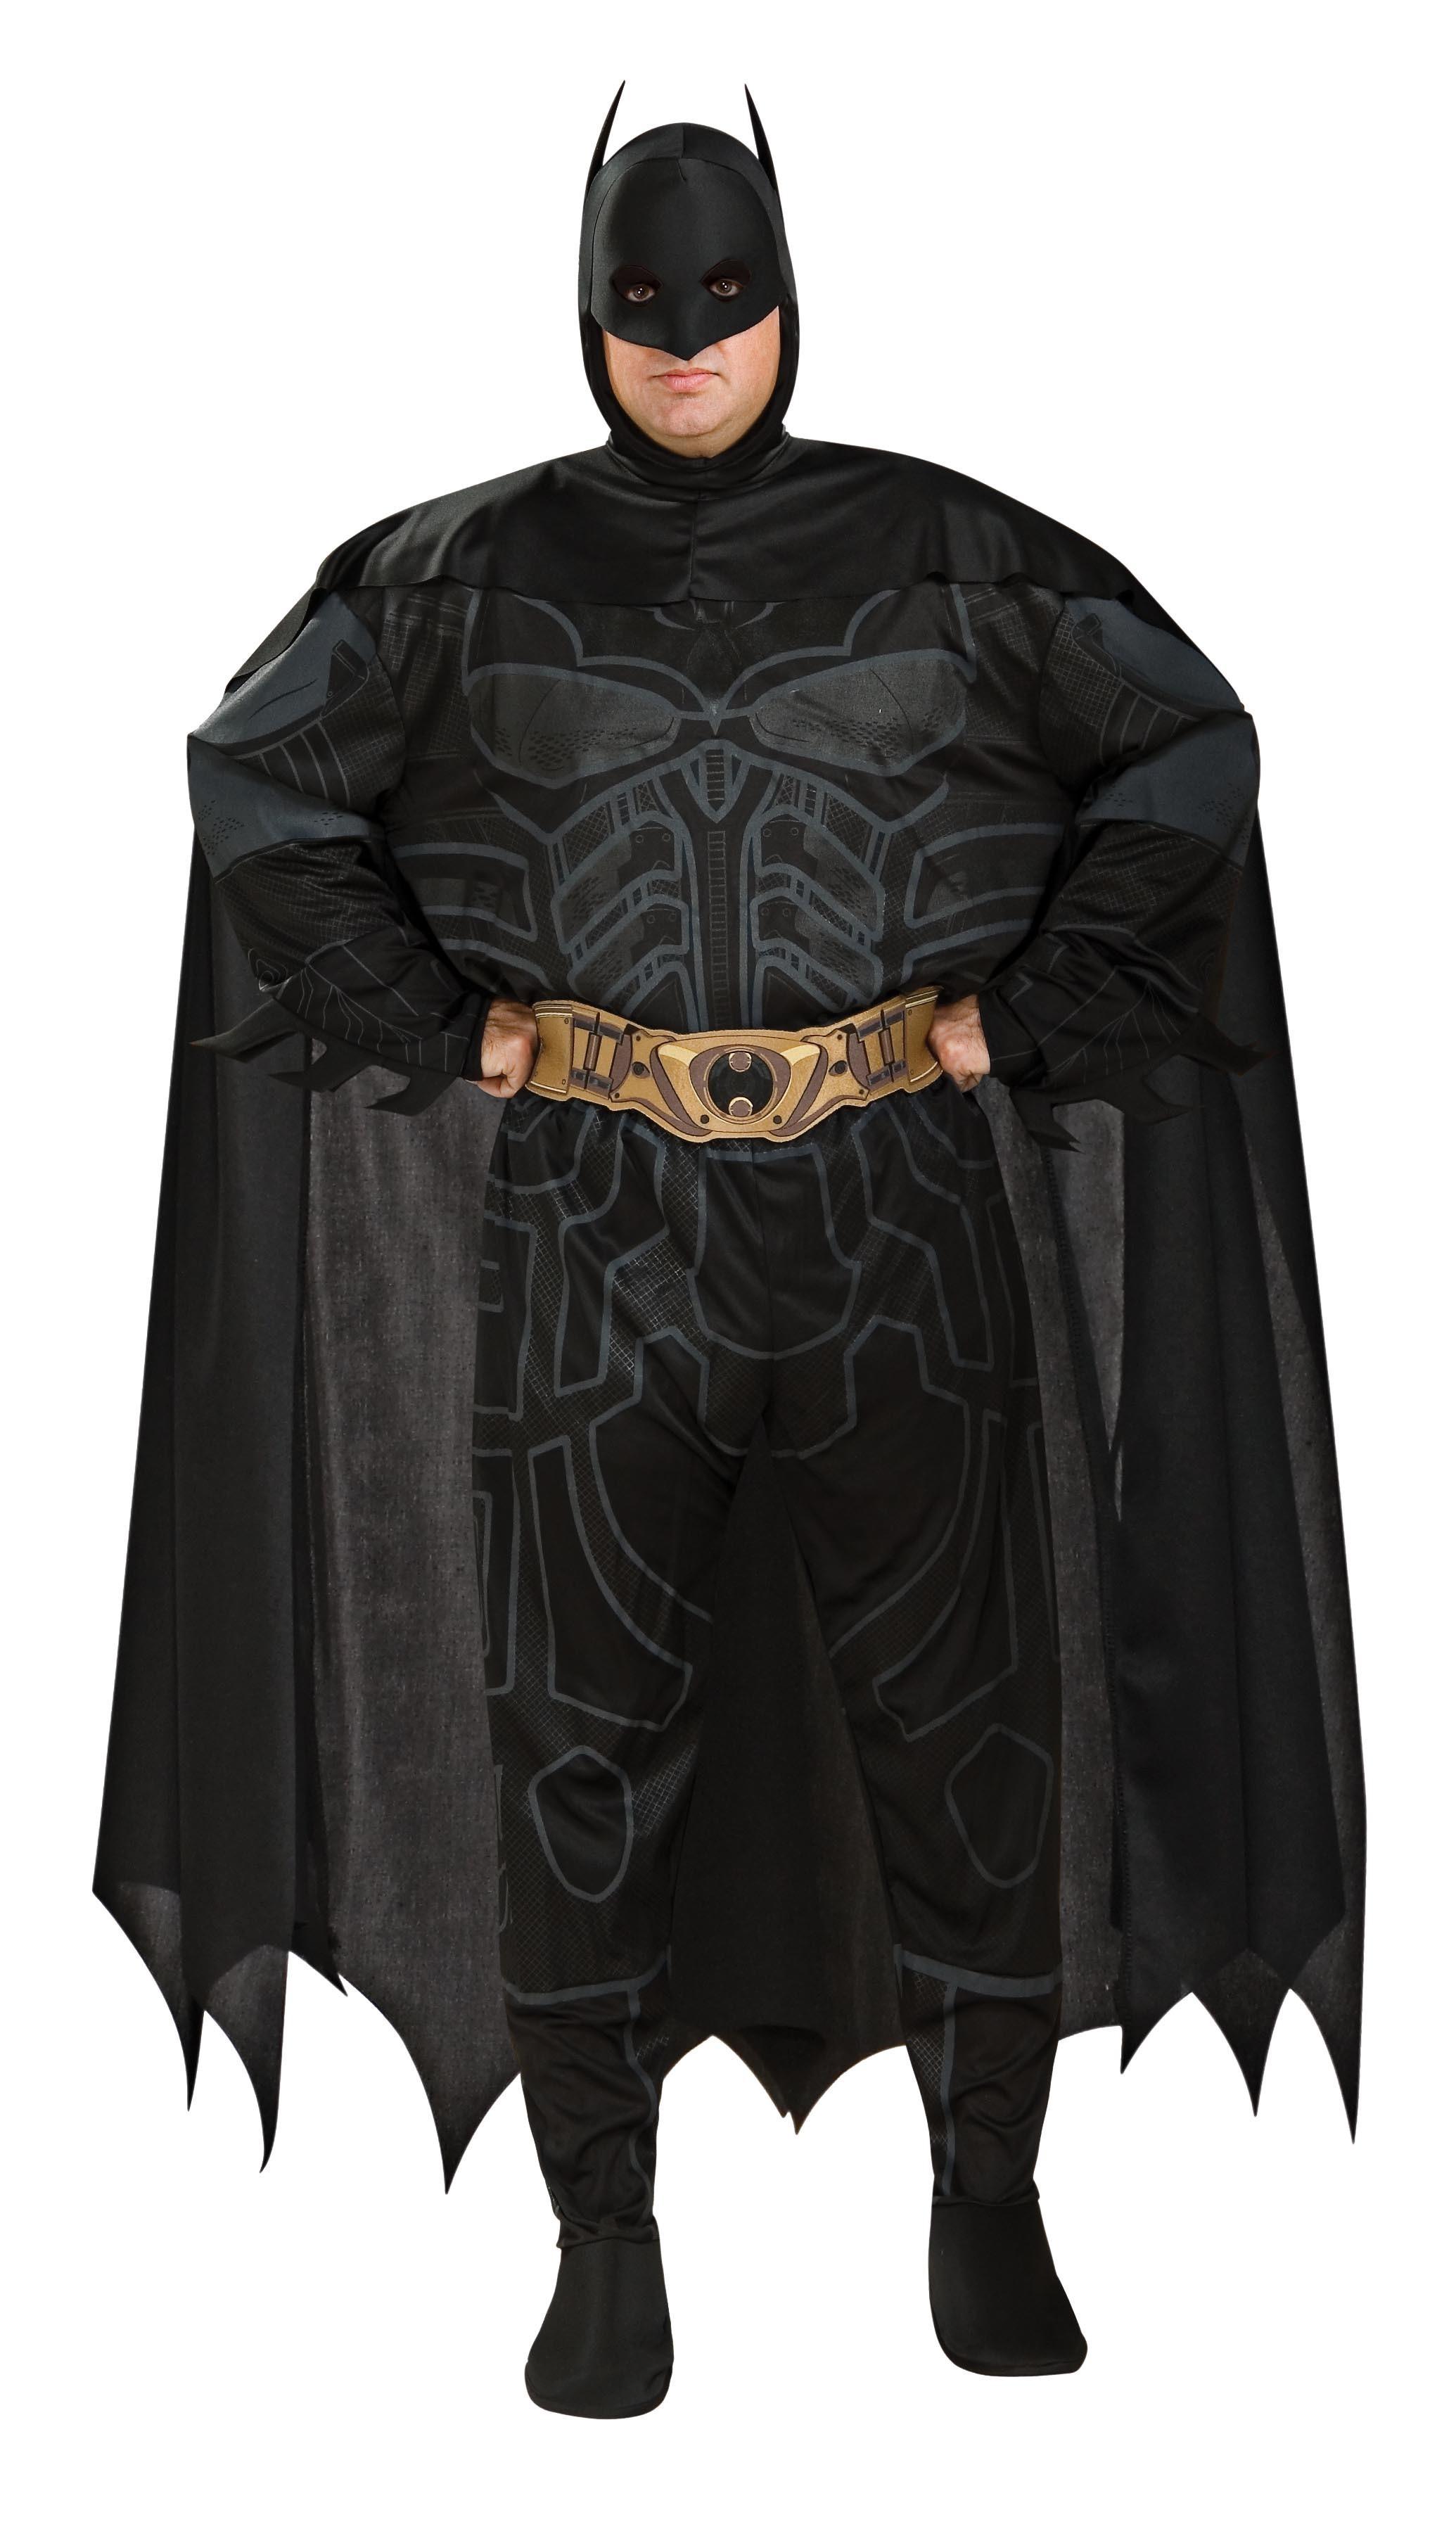 d guisement adulte batman grande taille vente de d guisements batman et d guisement adulte. Black Bedroom Furniture Sets. Home Design Ideas